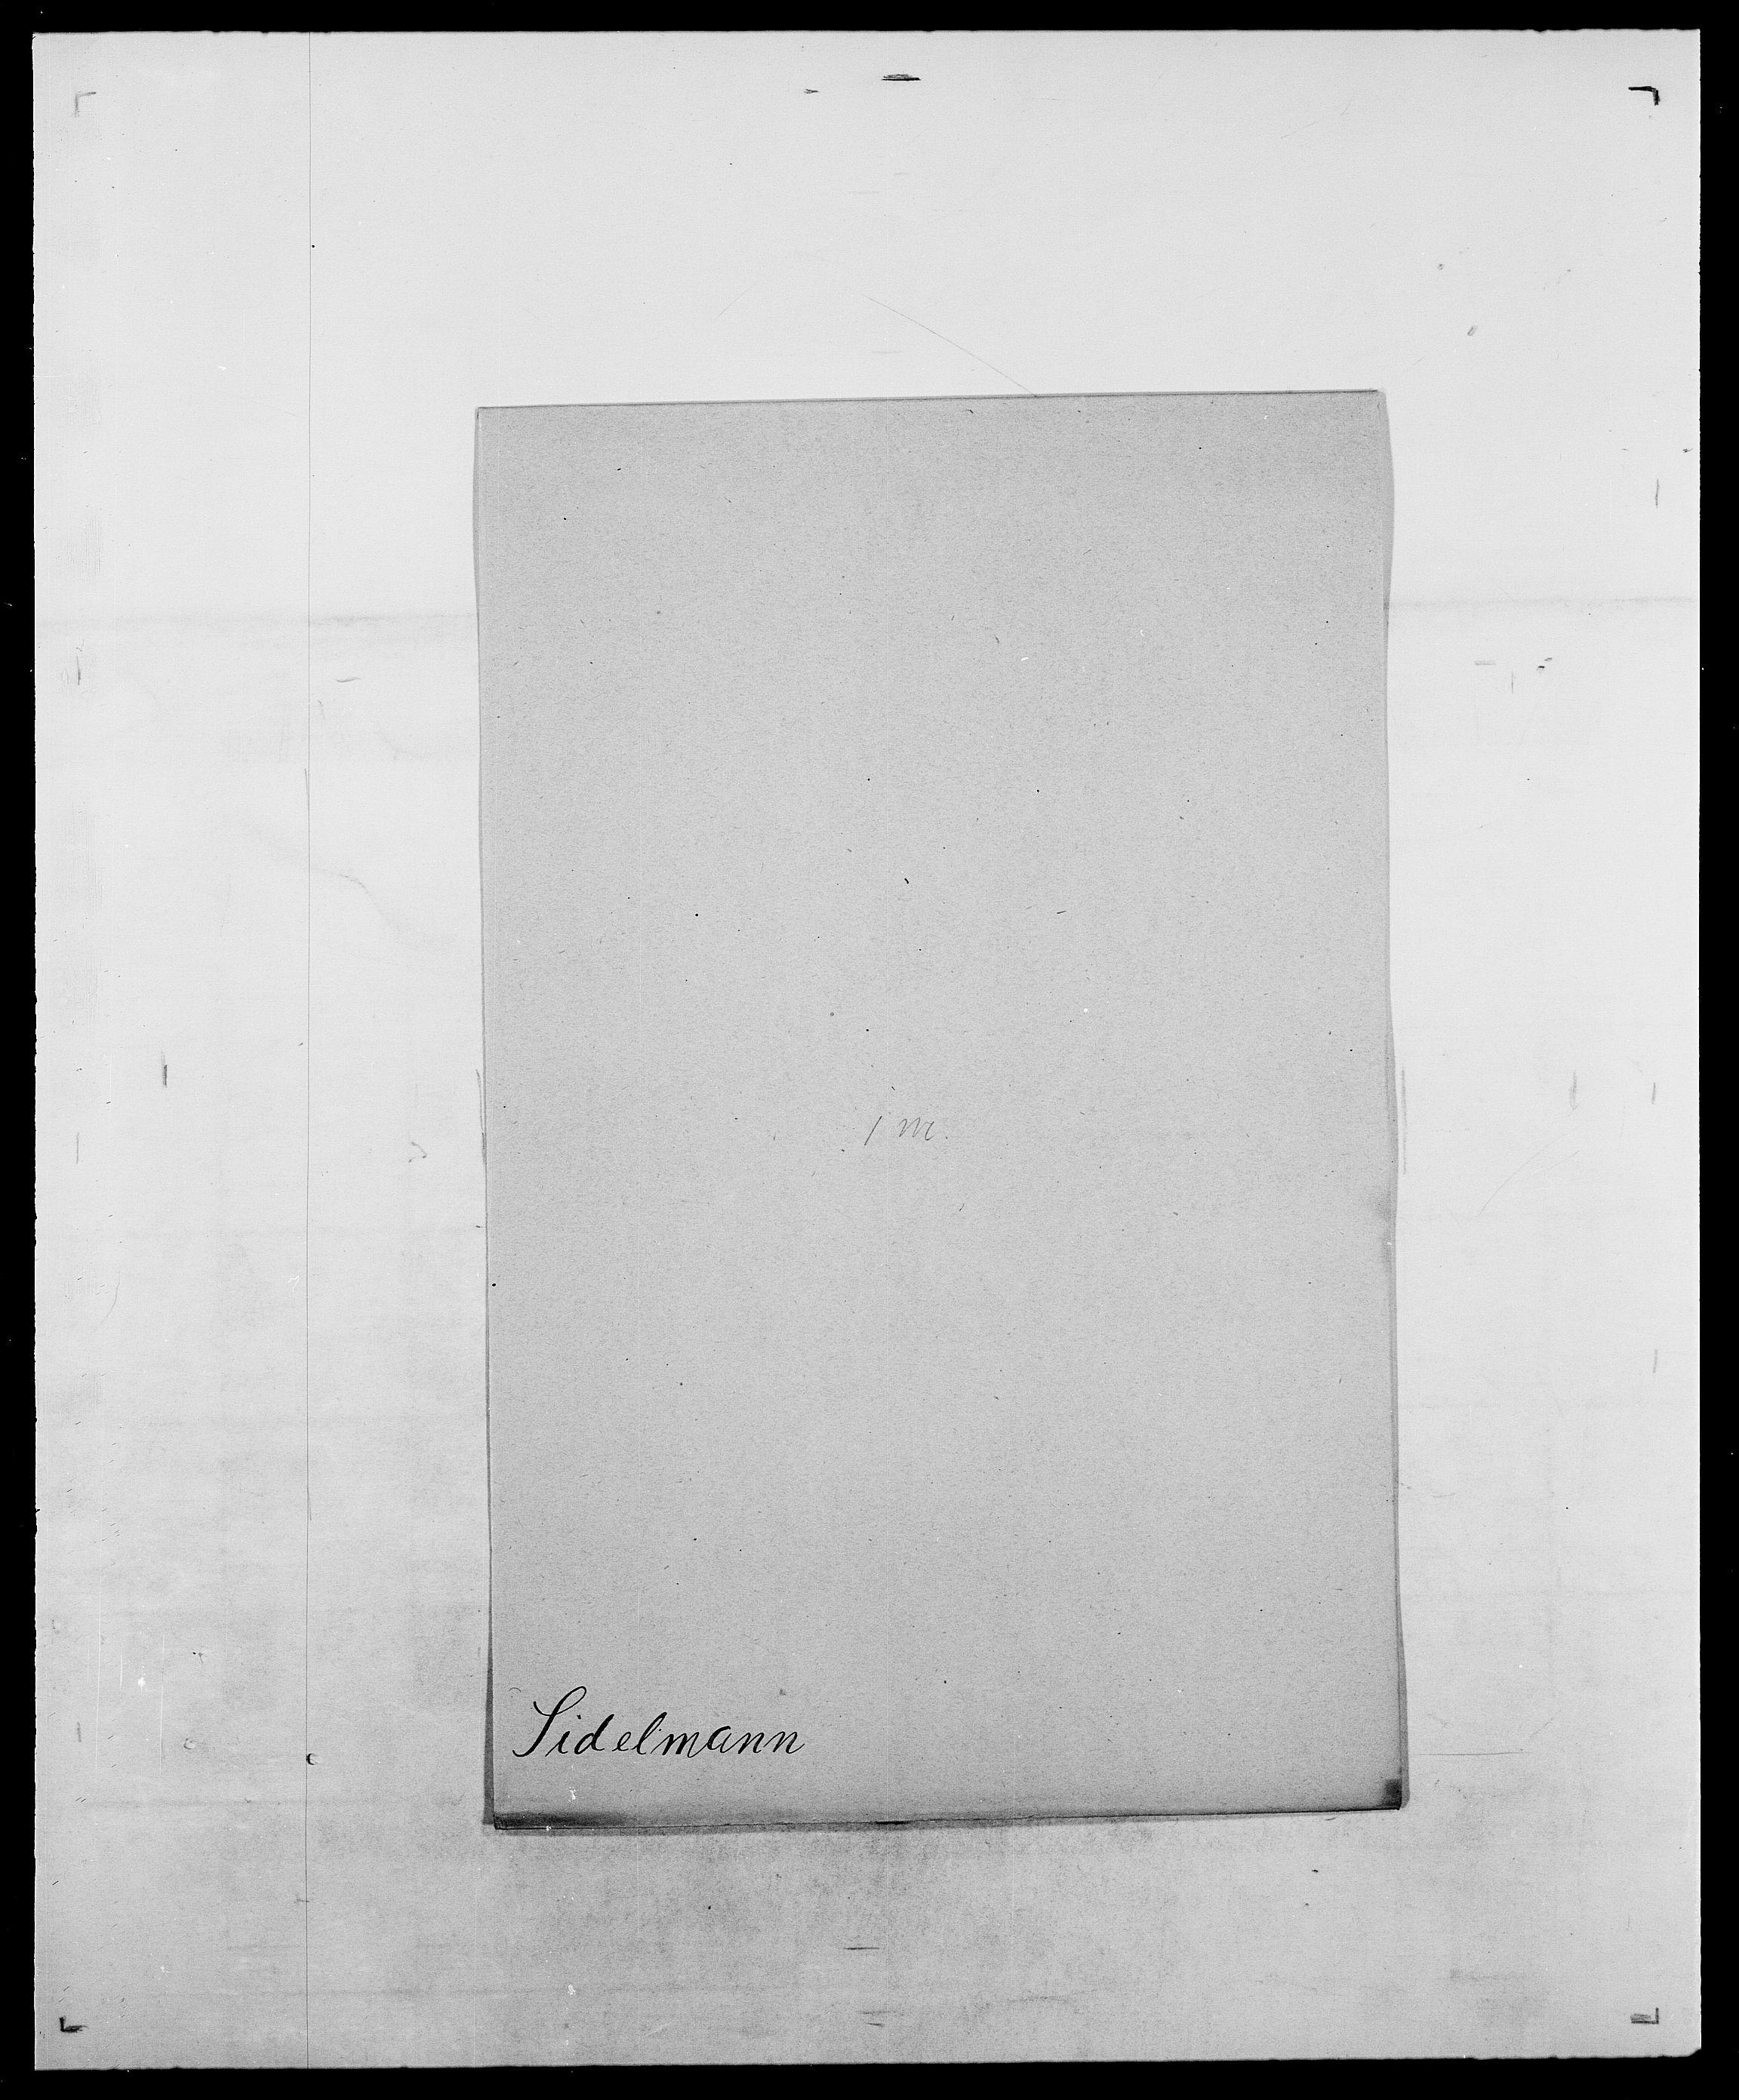 SAO, Delgobe, Charles Antoine - samling, D/Da/L0035: Schnabel - sjetman, s. 758